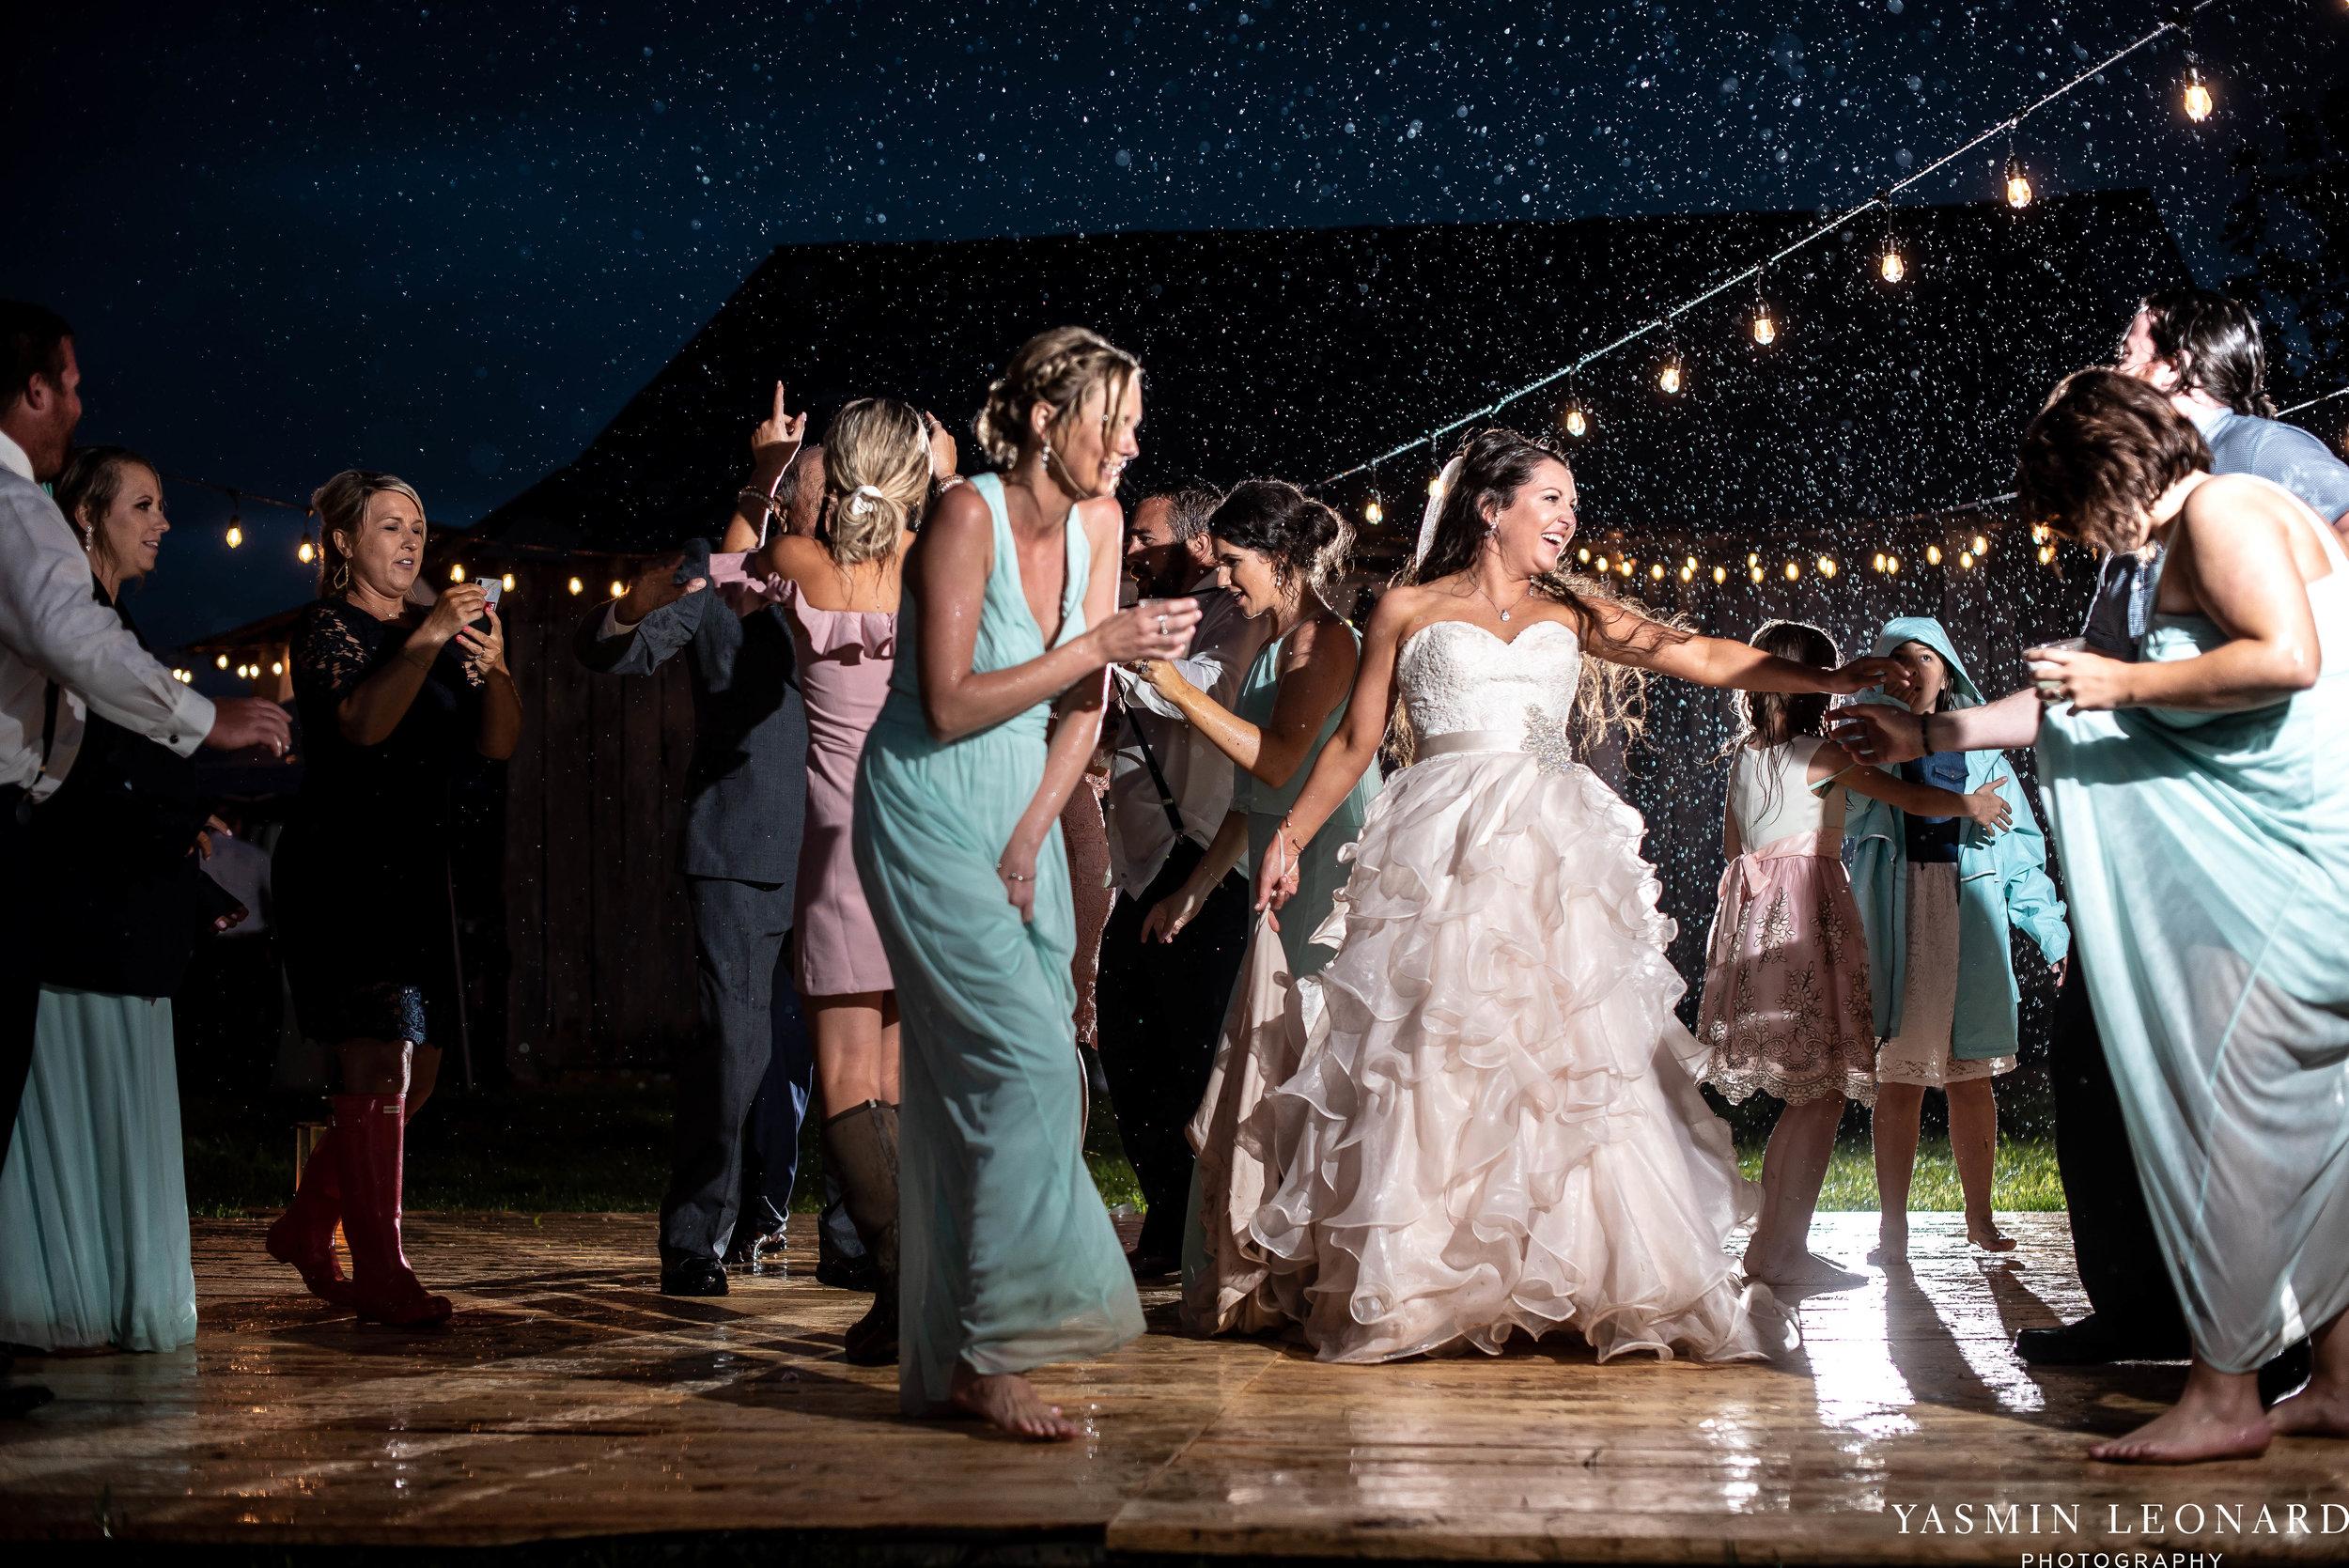 Rain on your wedding day - Rainy Wedding - Plan B for Rain - What to do if it rains on your wedding day - Wedding Inspiration - Outdoor wedding ideas - Rainy Wedding Pictures - Yasmin Leonard Photography-86.jpg